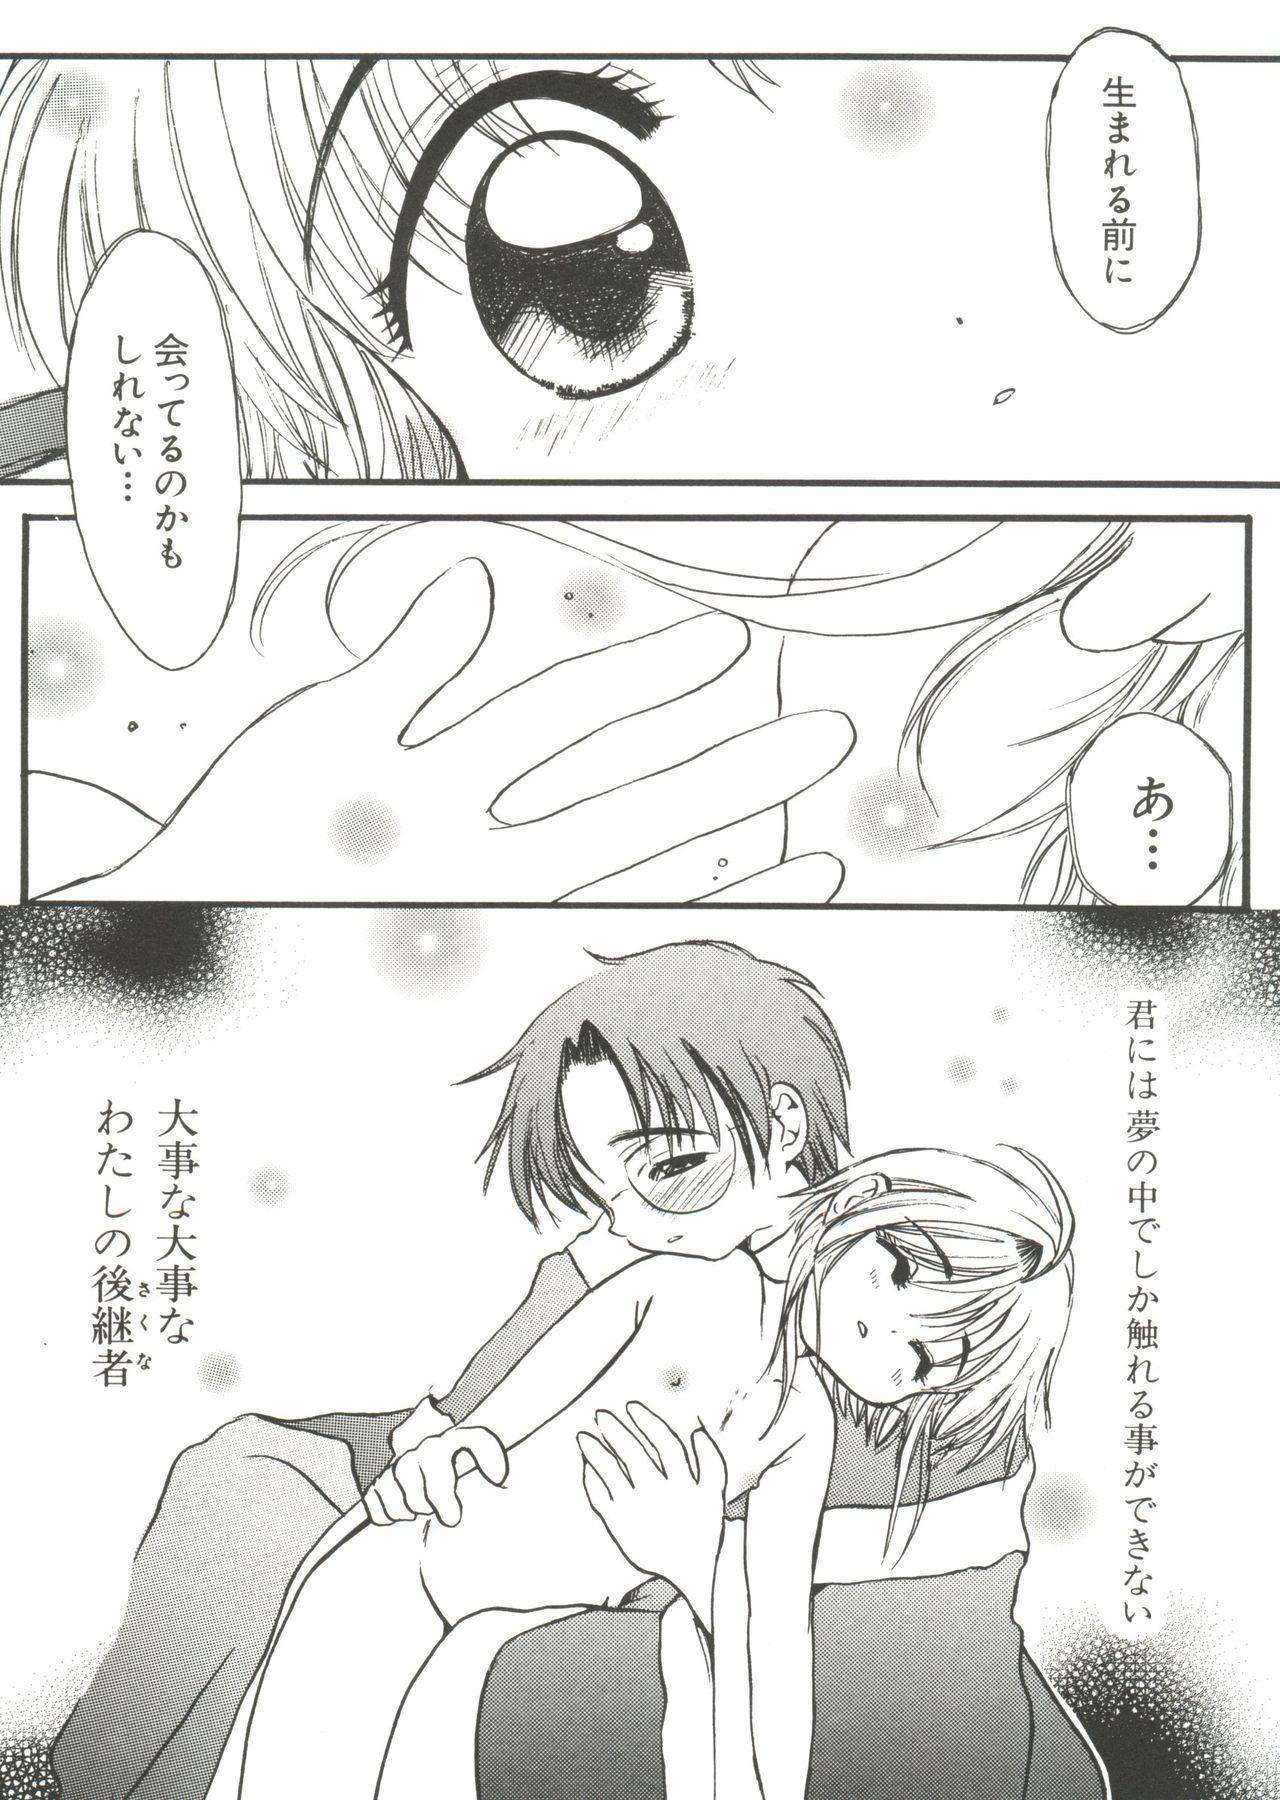 Naru Hina Z 2 72